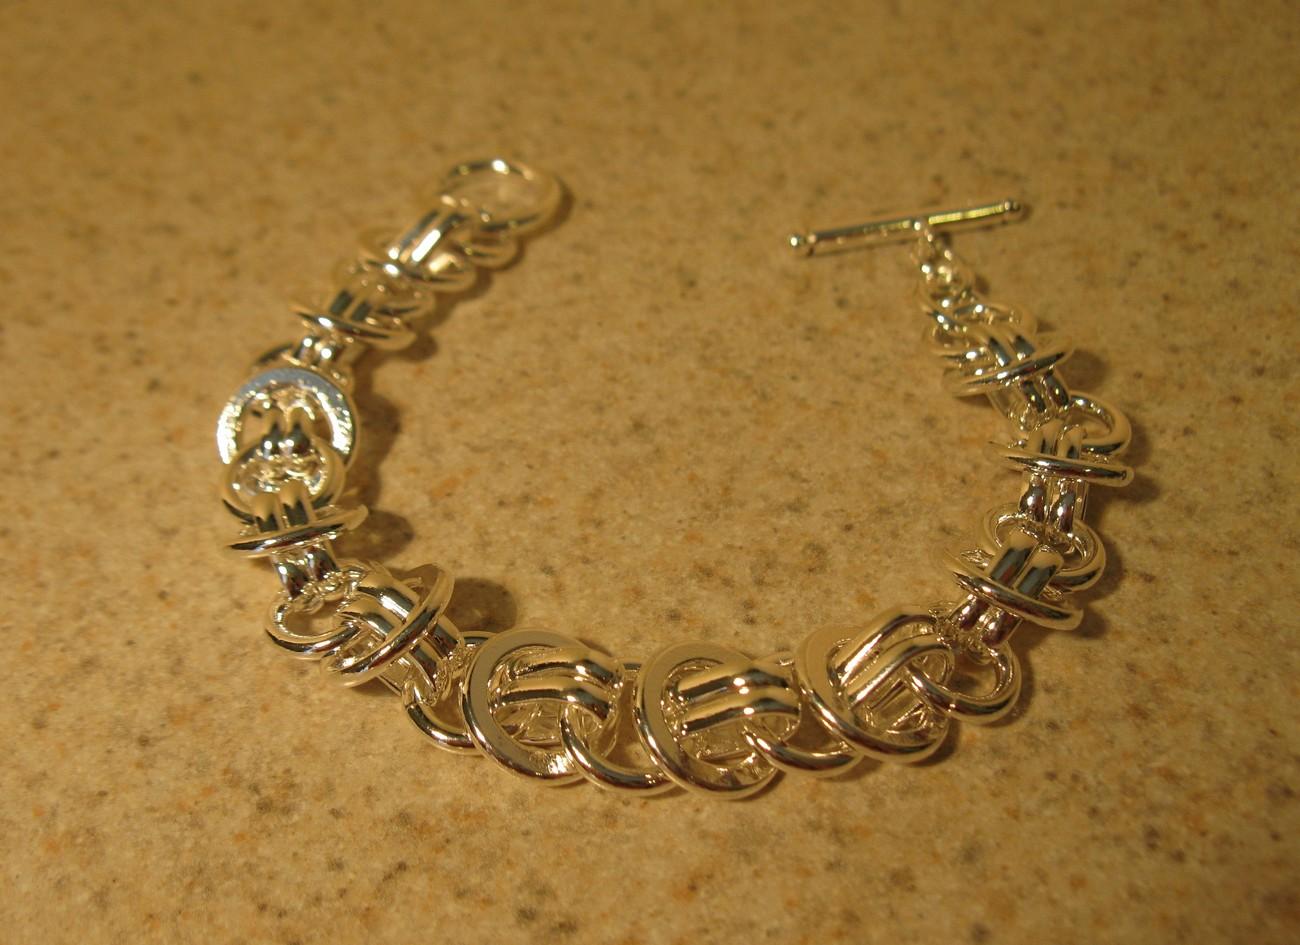 815 silver circle chain toggle